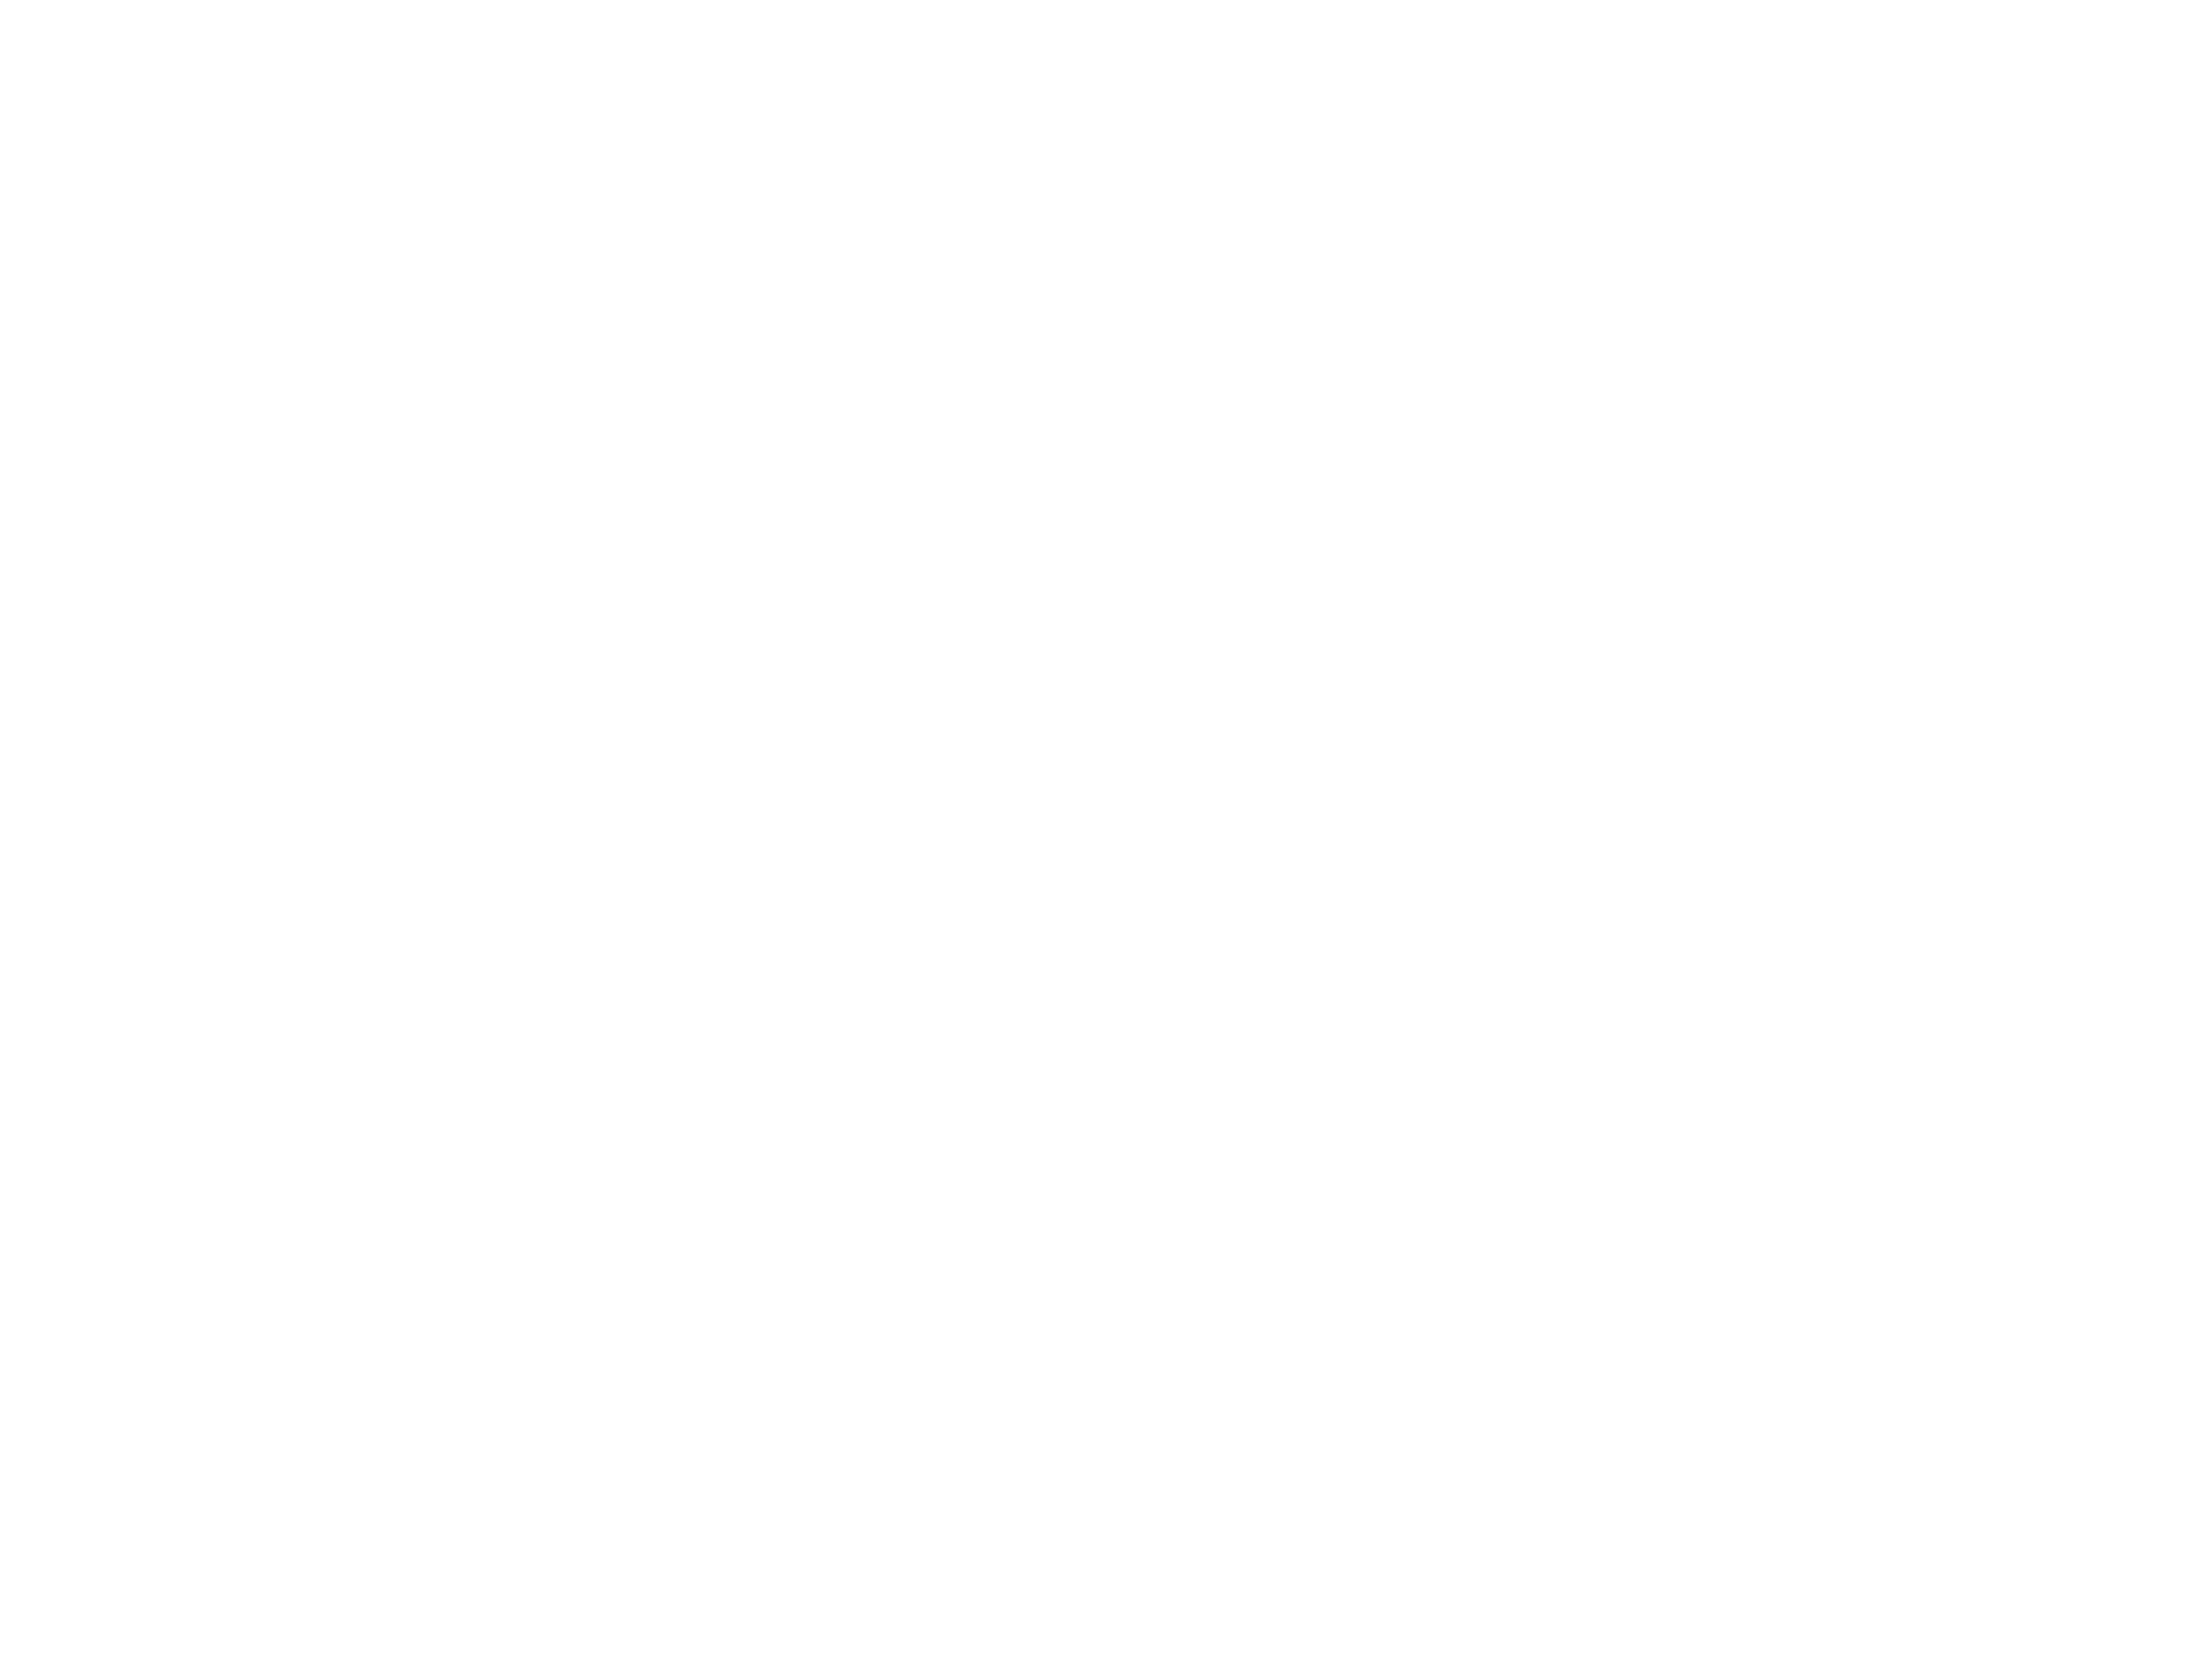 Werkzeugfräsmaschine Macmon M 434 V CNC – 07-07-106